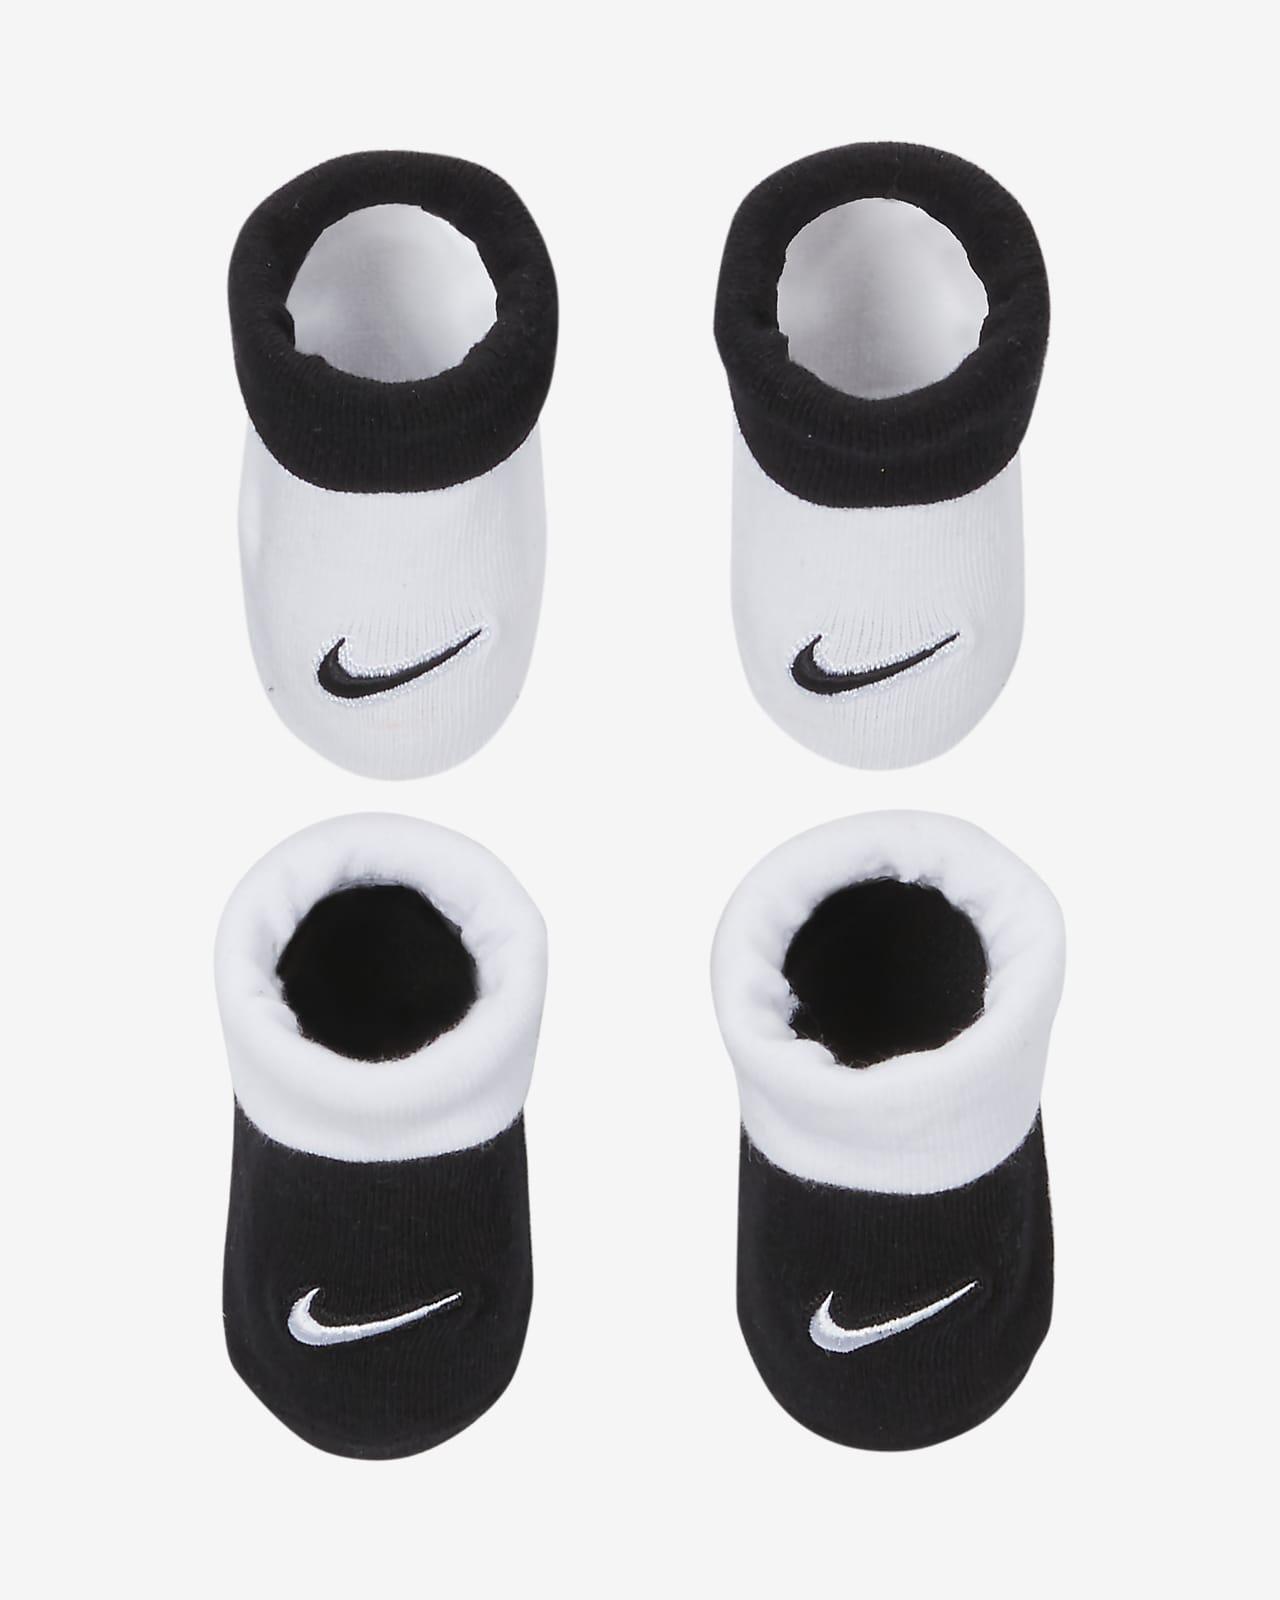 Nike Baby (0-6M) Booties (2 Pairs